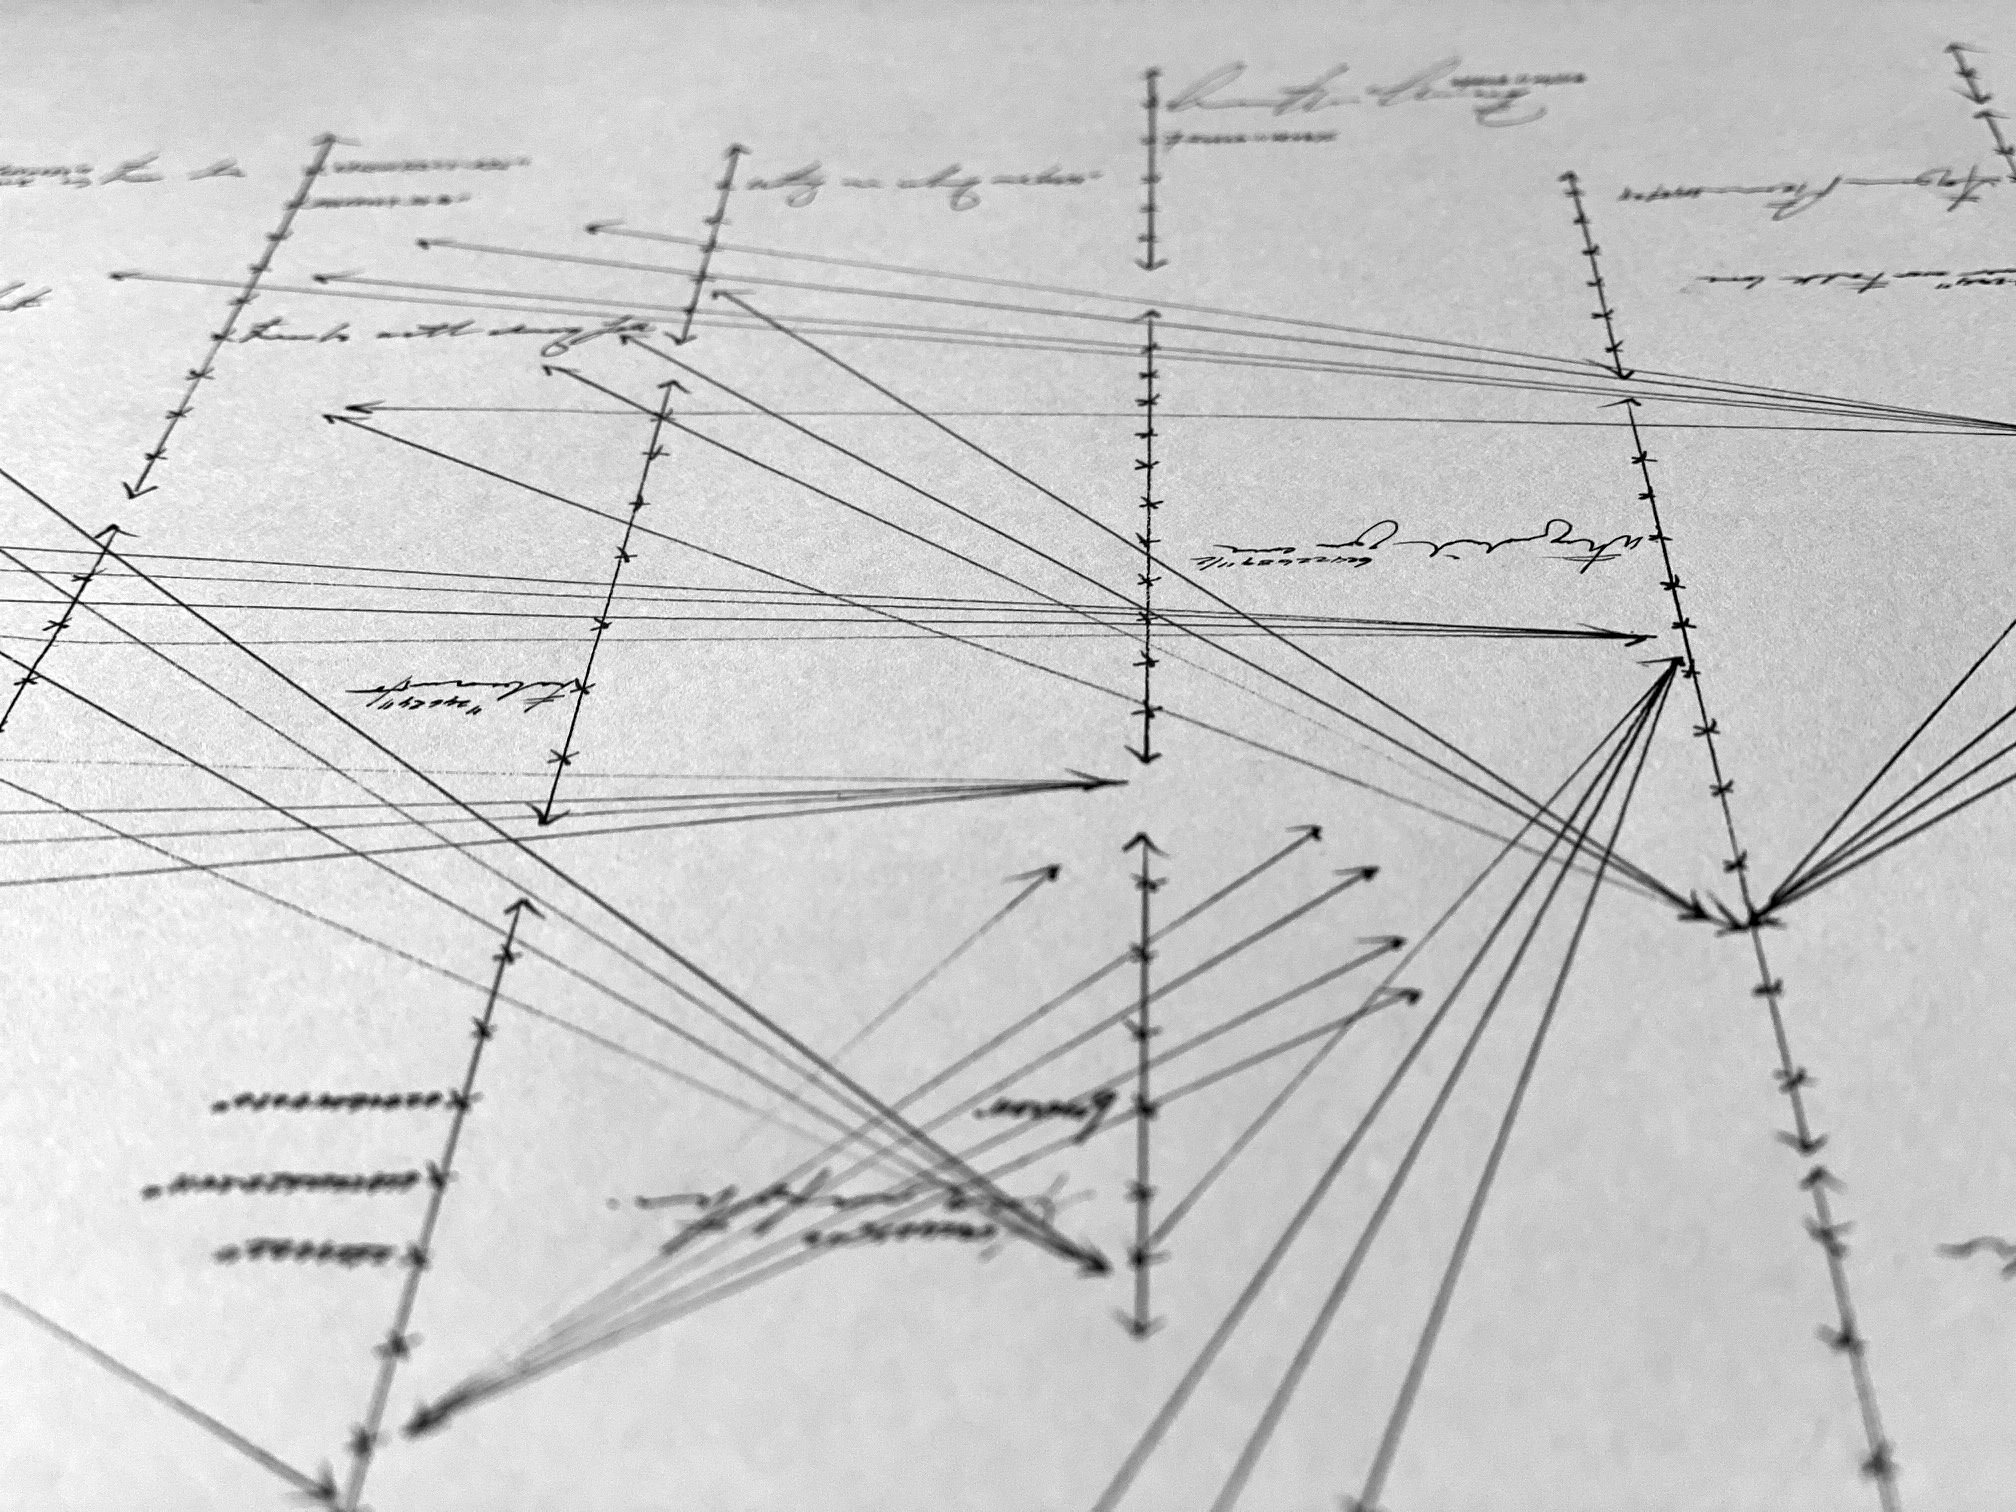 高端32个线条艺术技术草图绘图ps笔刷designshidai_bishua092